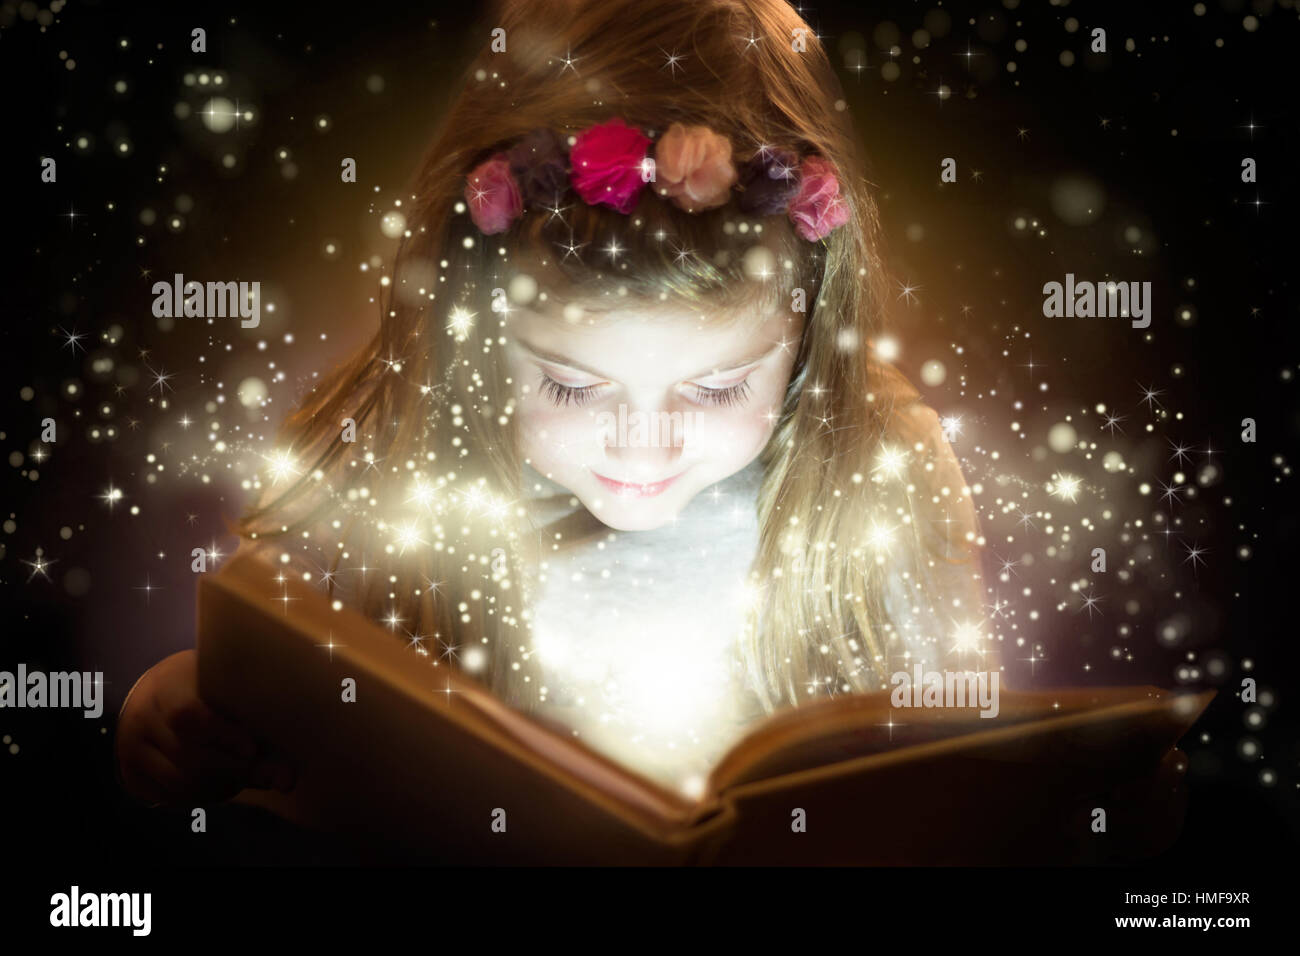 Hermosa niña leyendo libro mágico, concepto de fantasía Imagen De Stock